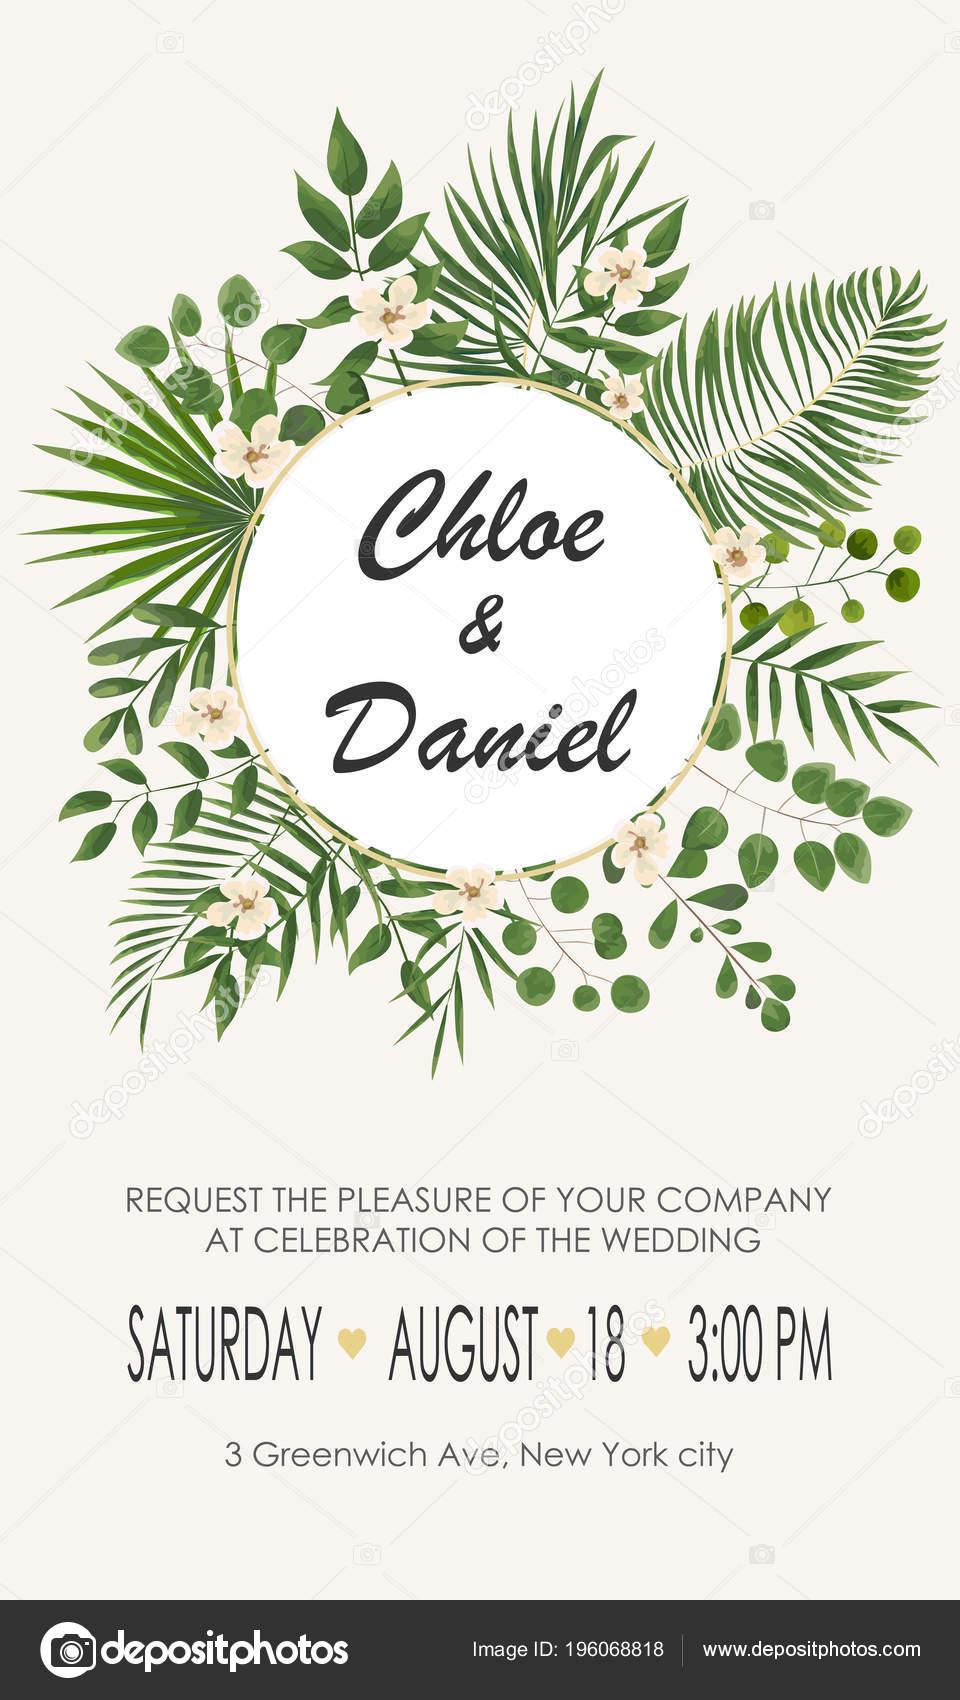 Wedding Invitation Template Flowers Green Leaves Rsvp Modern Card